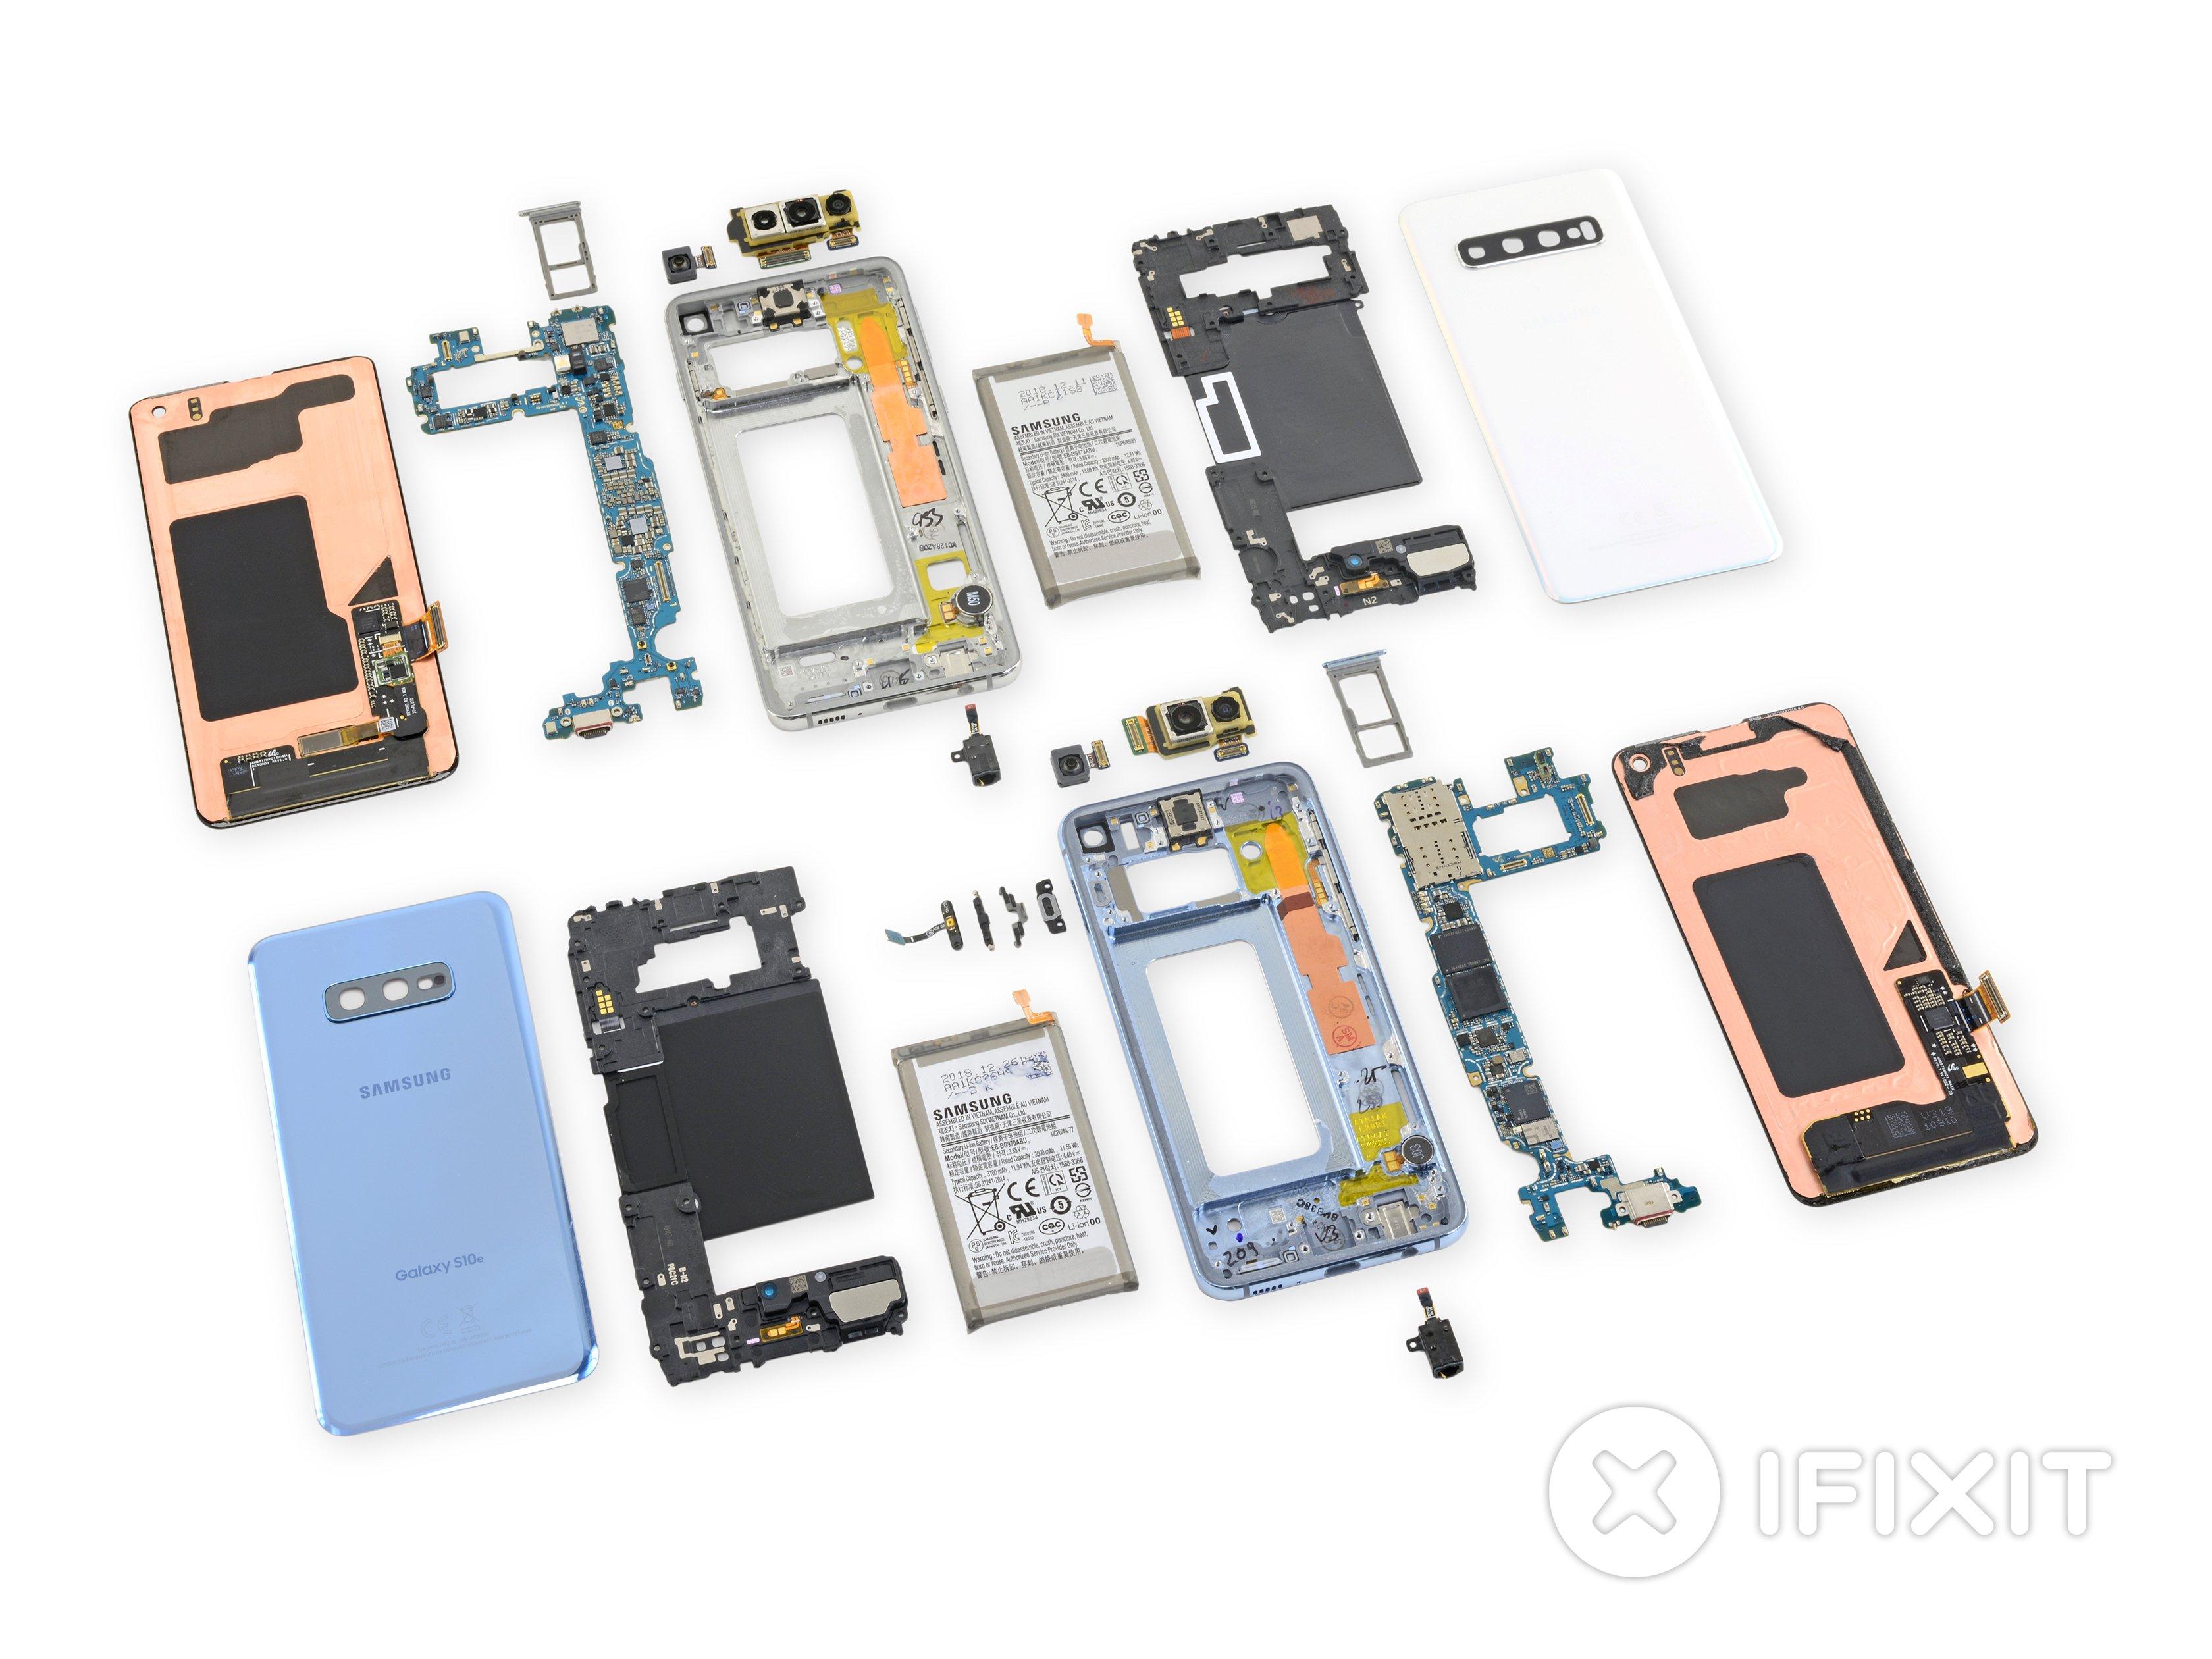 ec202a6d340cf1 Samsung Galaxy S10 and S10e Teardown - iFixit